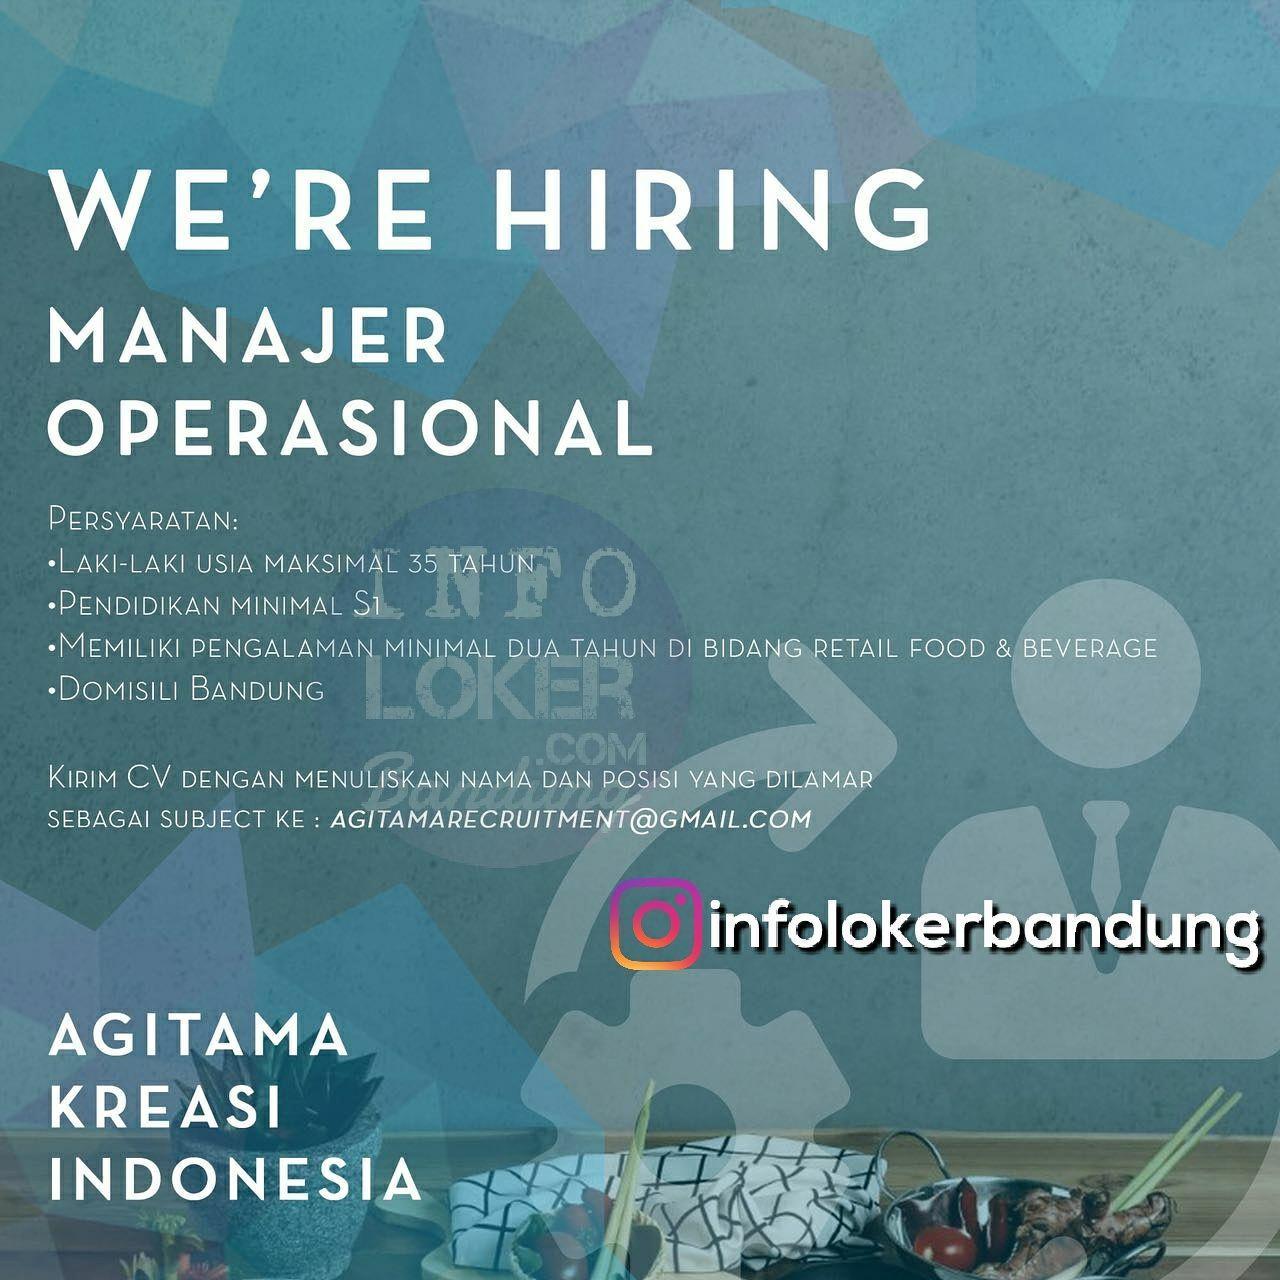 Lowongan Kerja CV. Agitama Kreasi Indonesia Bandung Februari 2018